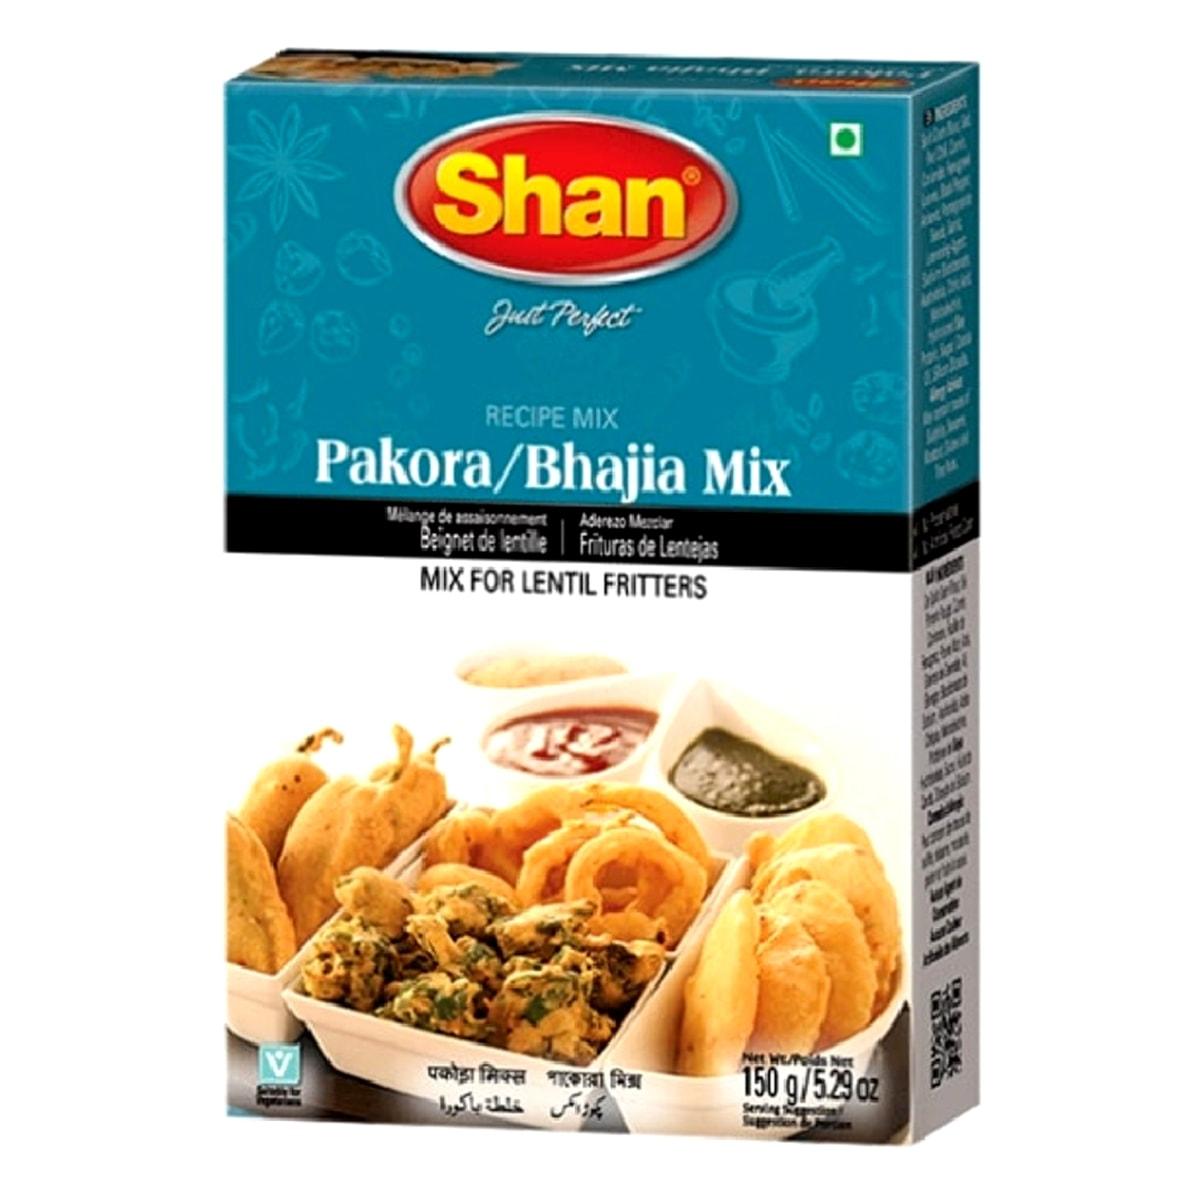 Buy Shan Pakora / Bhajia Mix - 150 gm